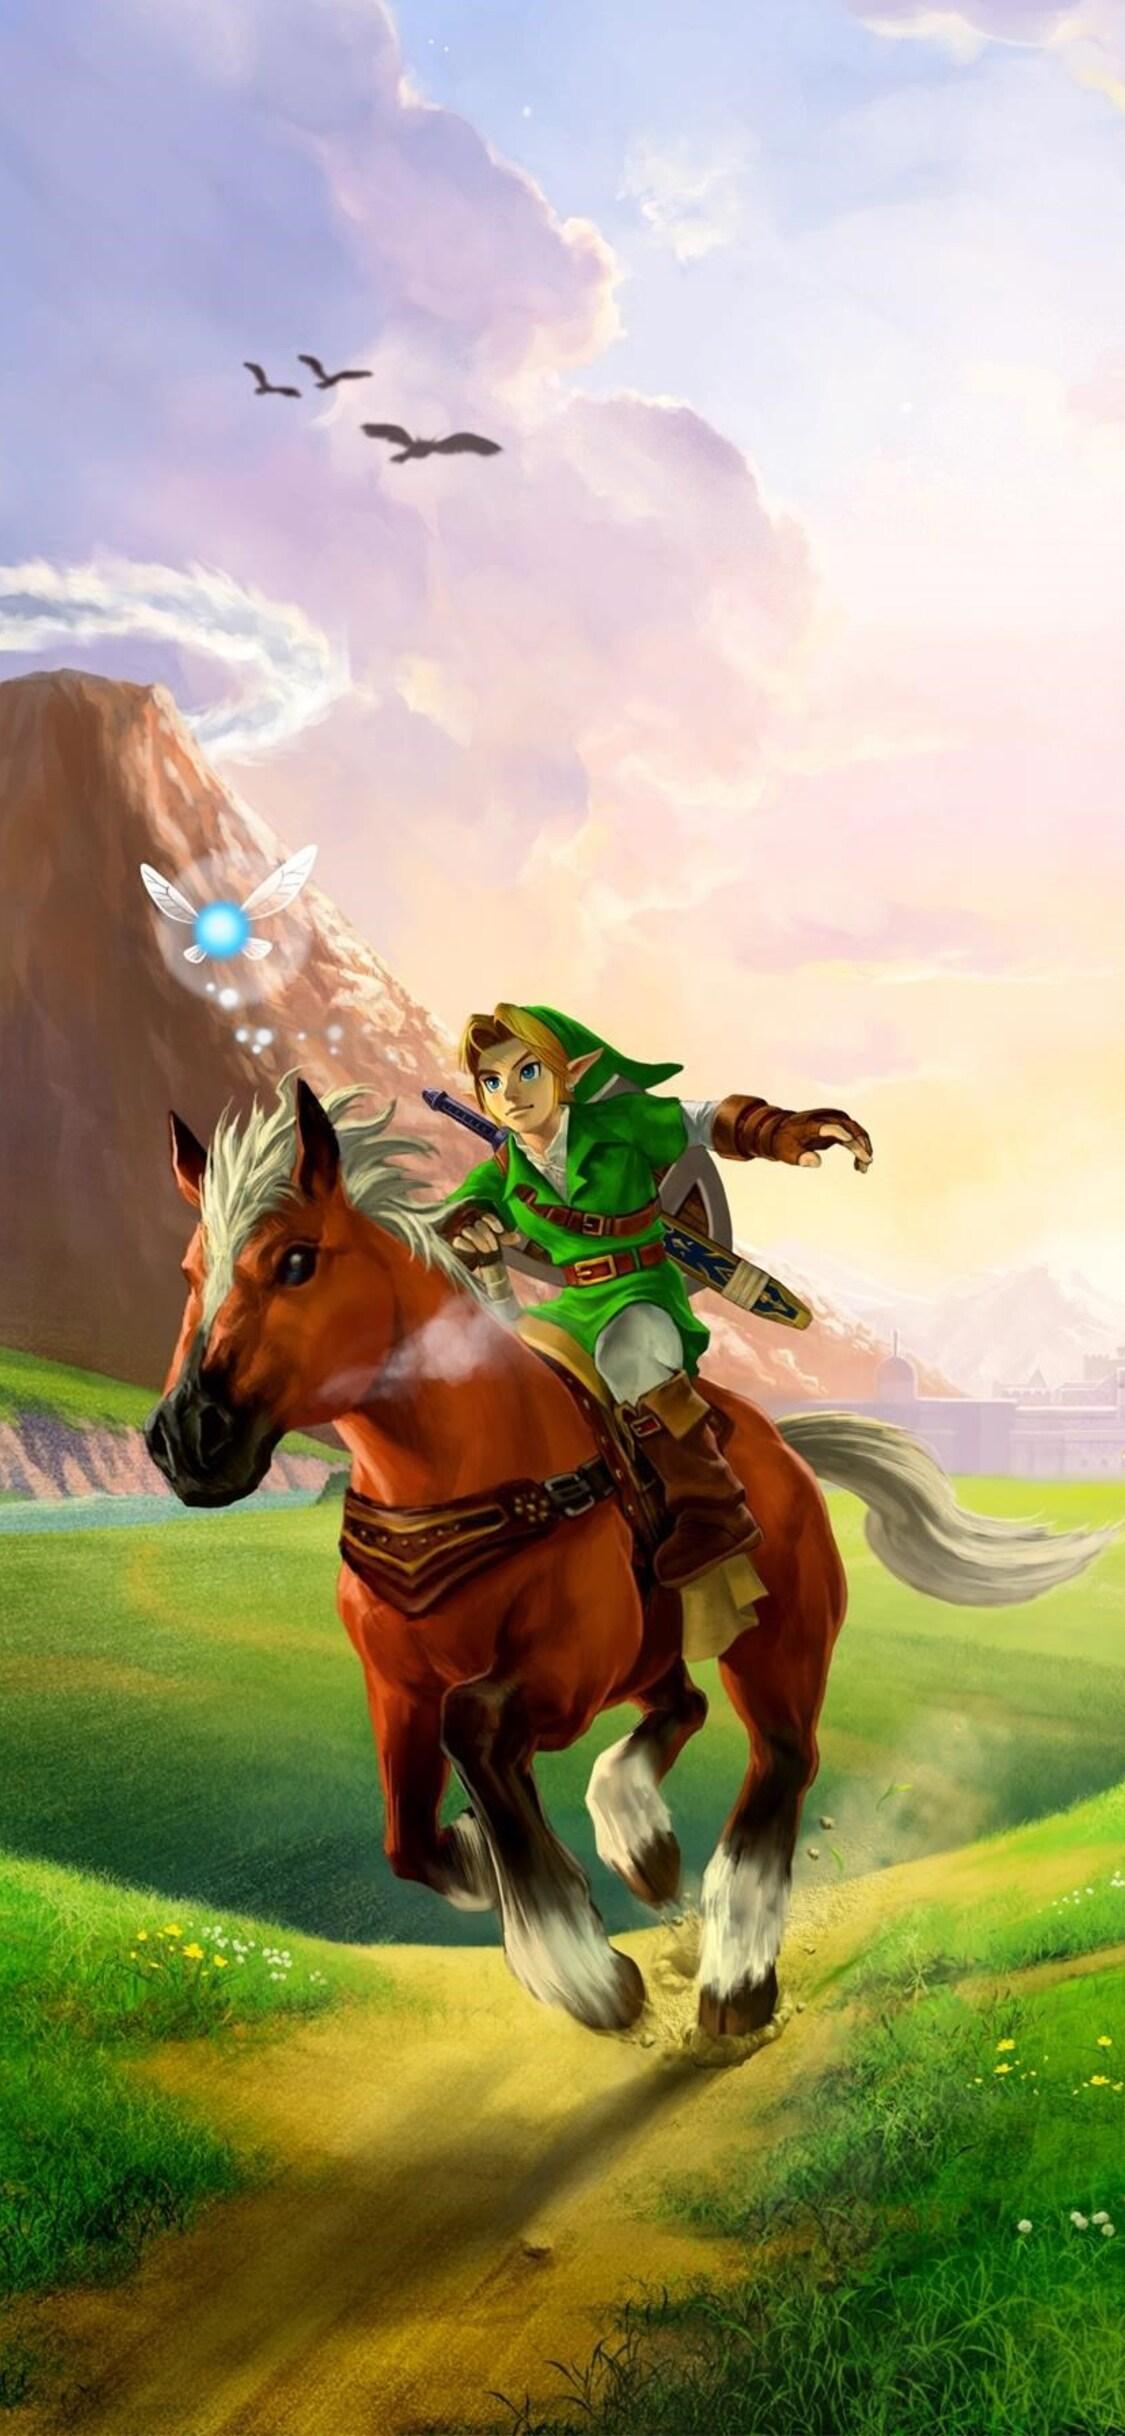 1125x2436 The Legend Of Zelda Ocarina Of Time 3d Iphone Xs Iphone